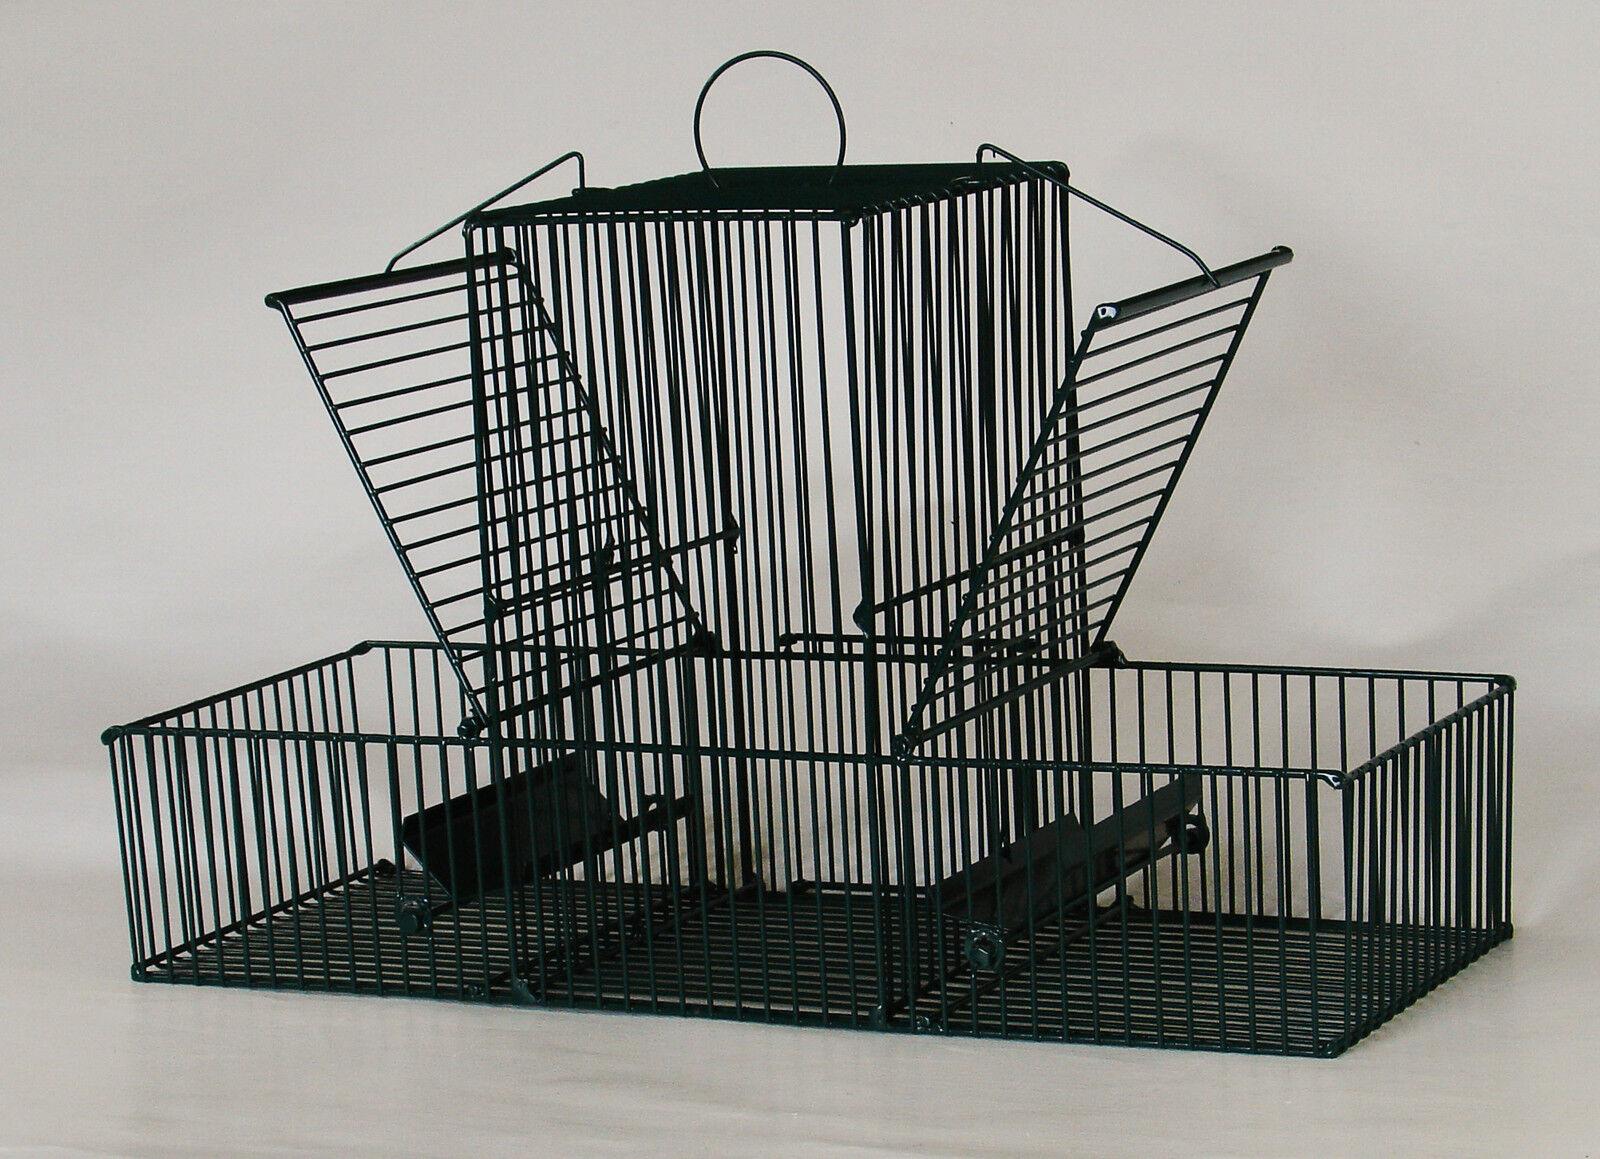 Pájaro trampa con lockvogelabteil y 2 fangabteilen - @ @ @heka  1x Art. 85072